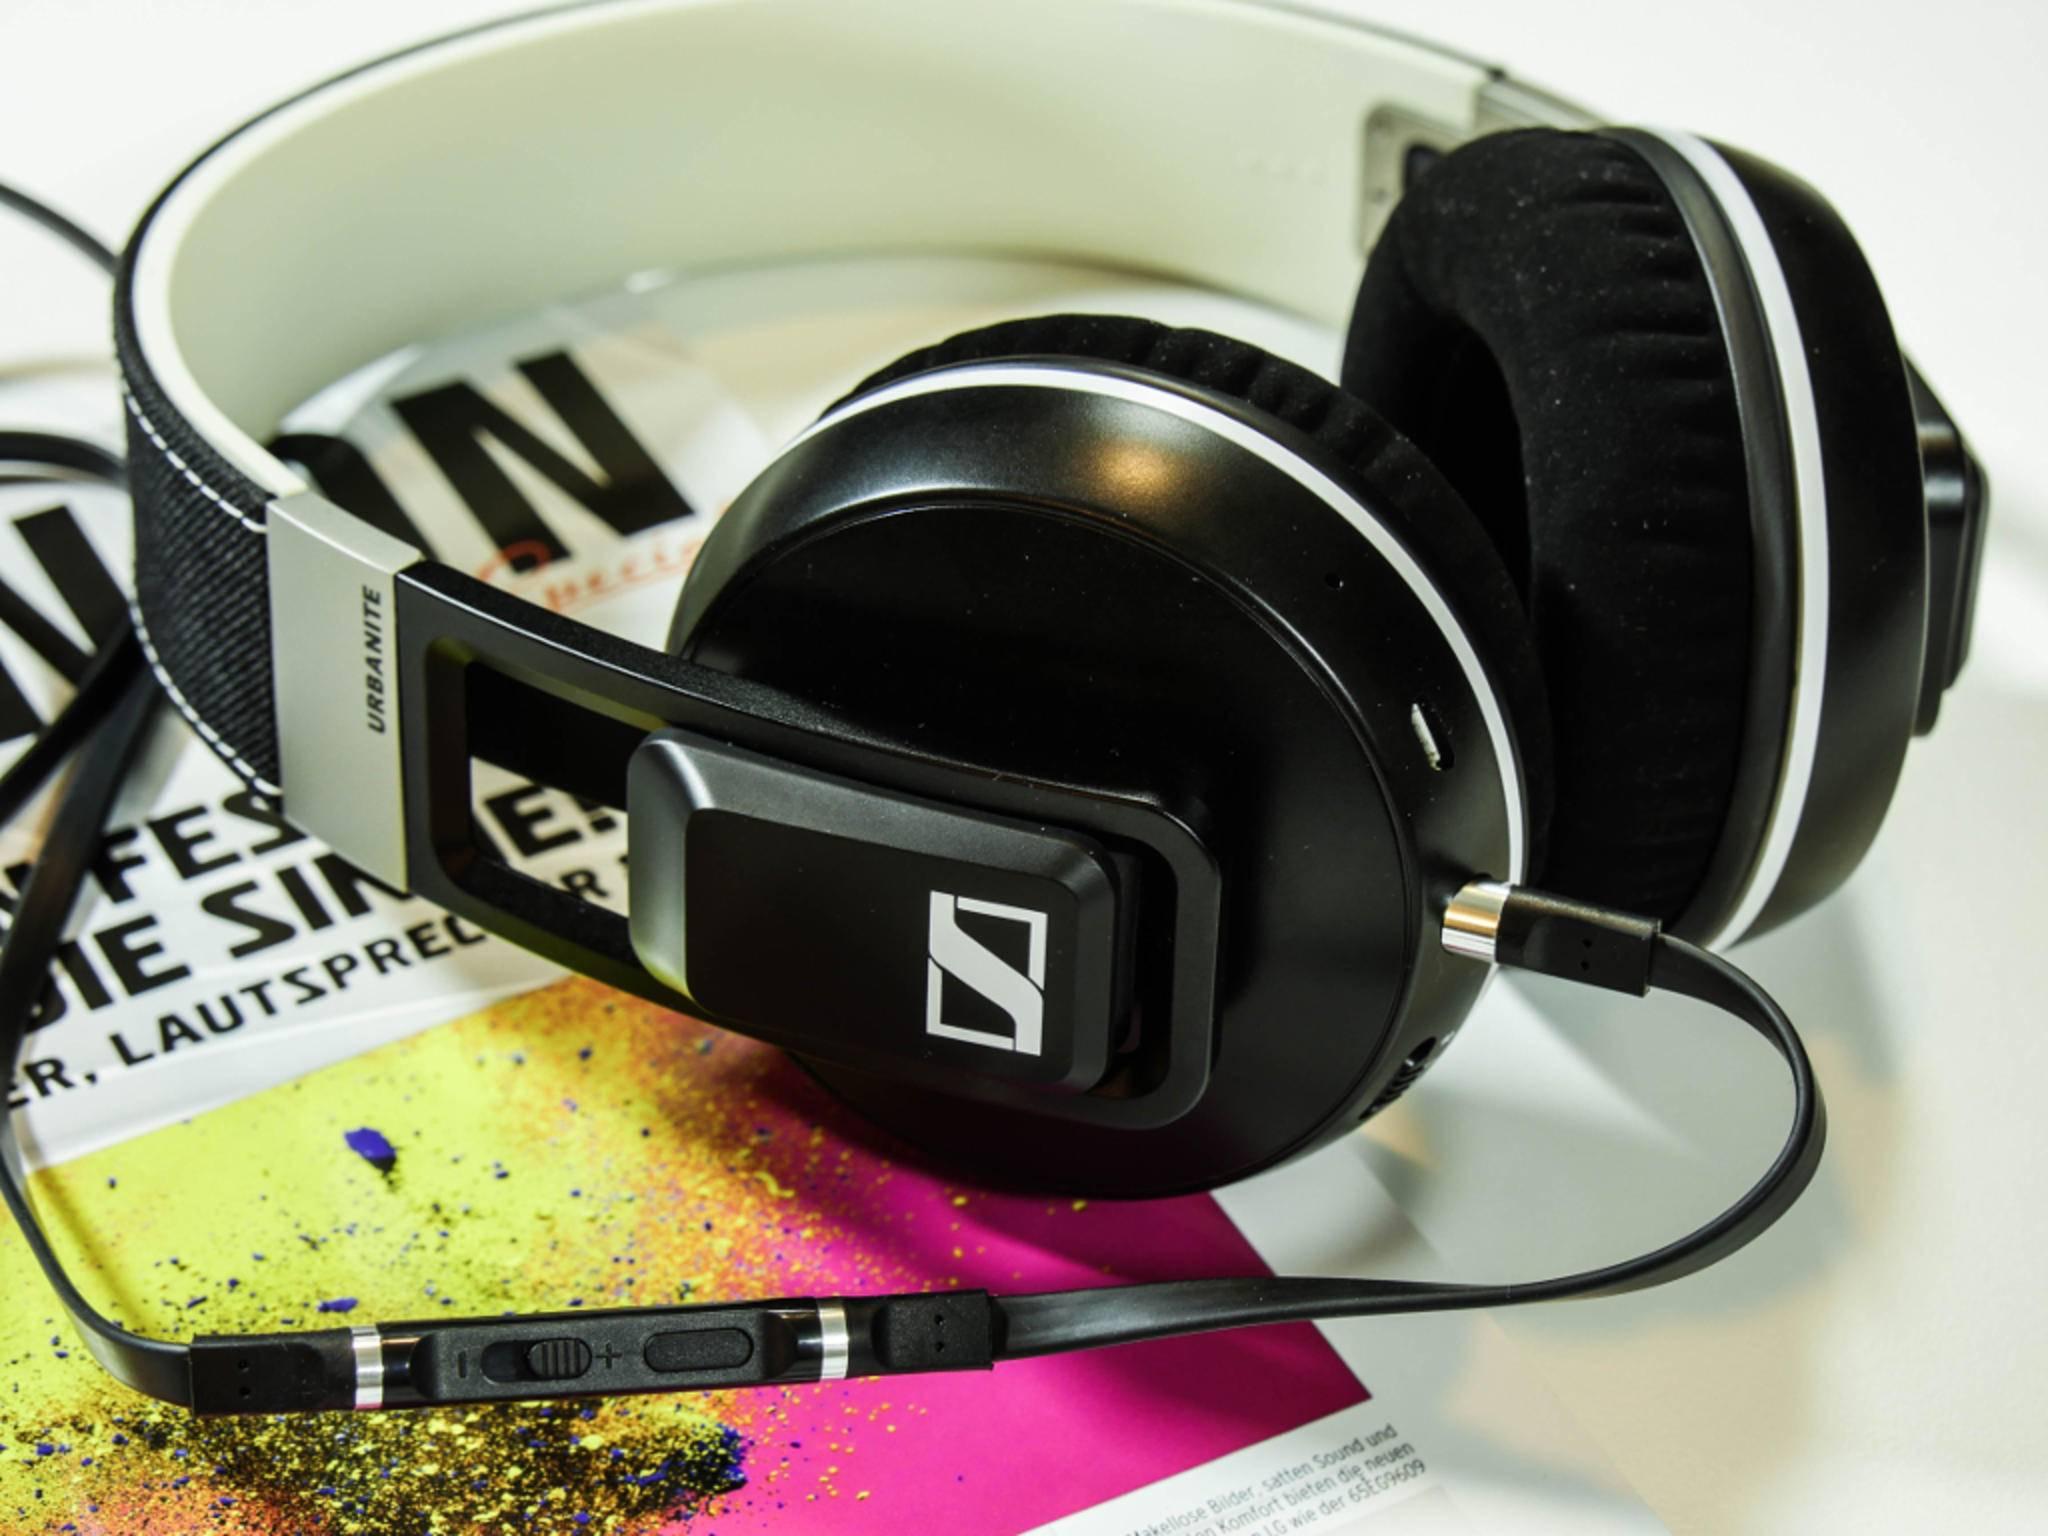 Wem unterwegs der Saft ausgeht, der kann den Kopfhörer auch per Kabel anschließen.